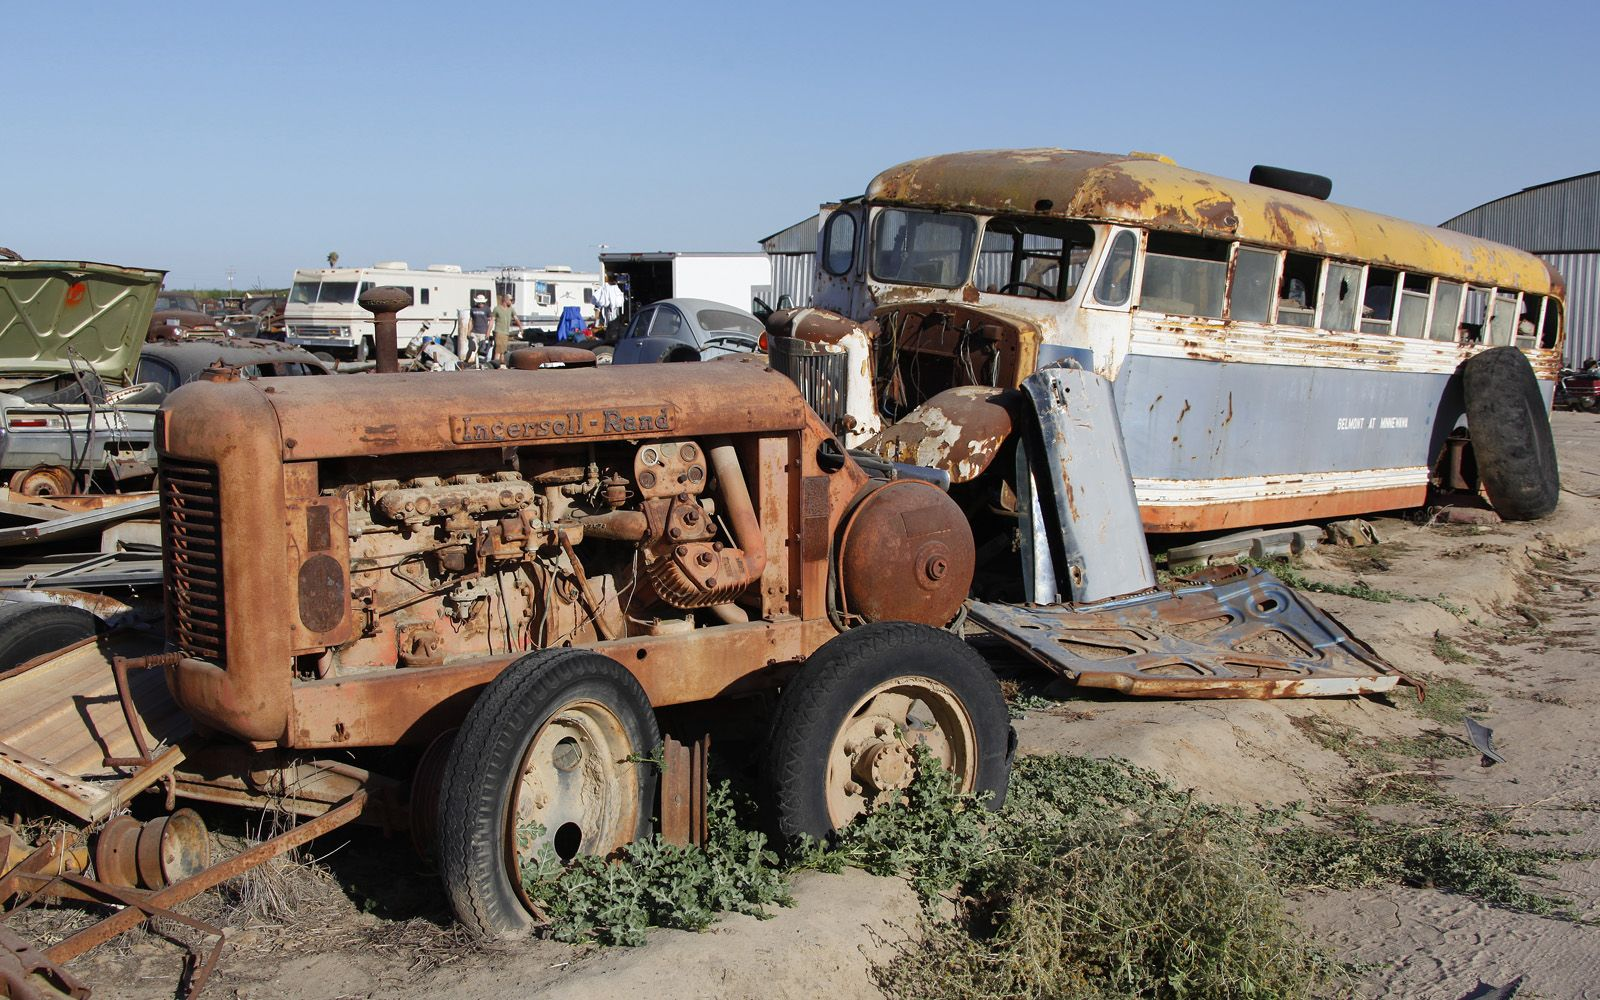 junkyard-vintage-cars-turners-auto-wrecking-fresno-california-150 ...